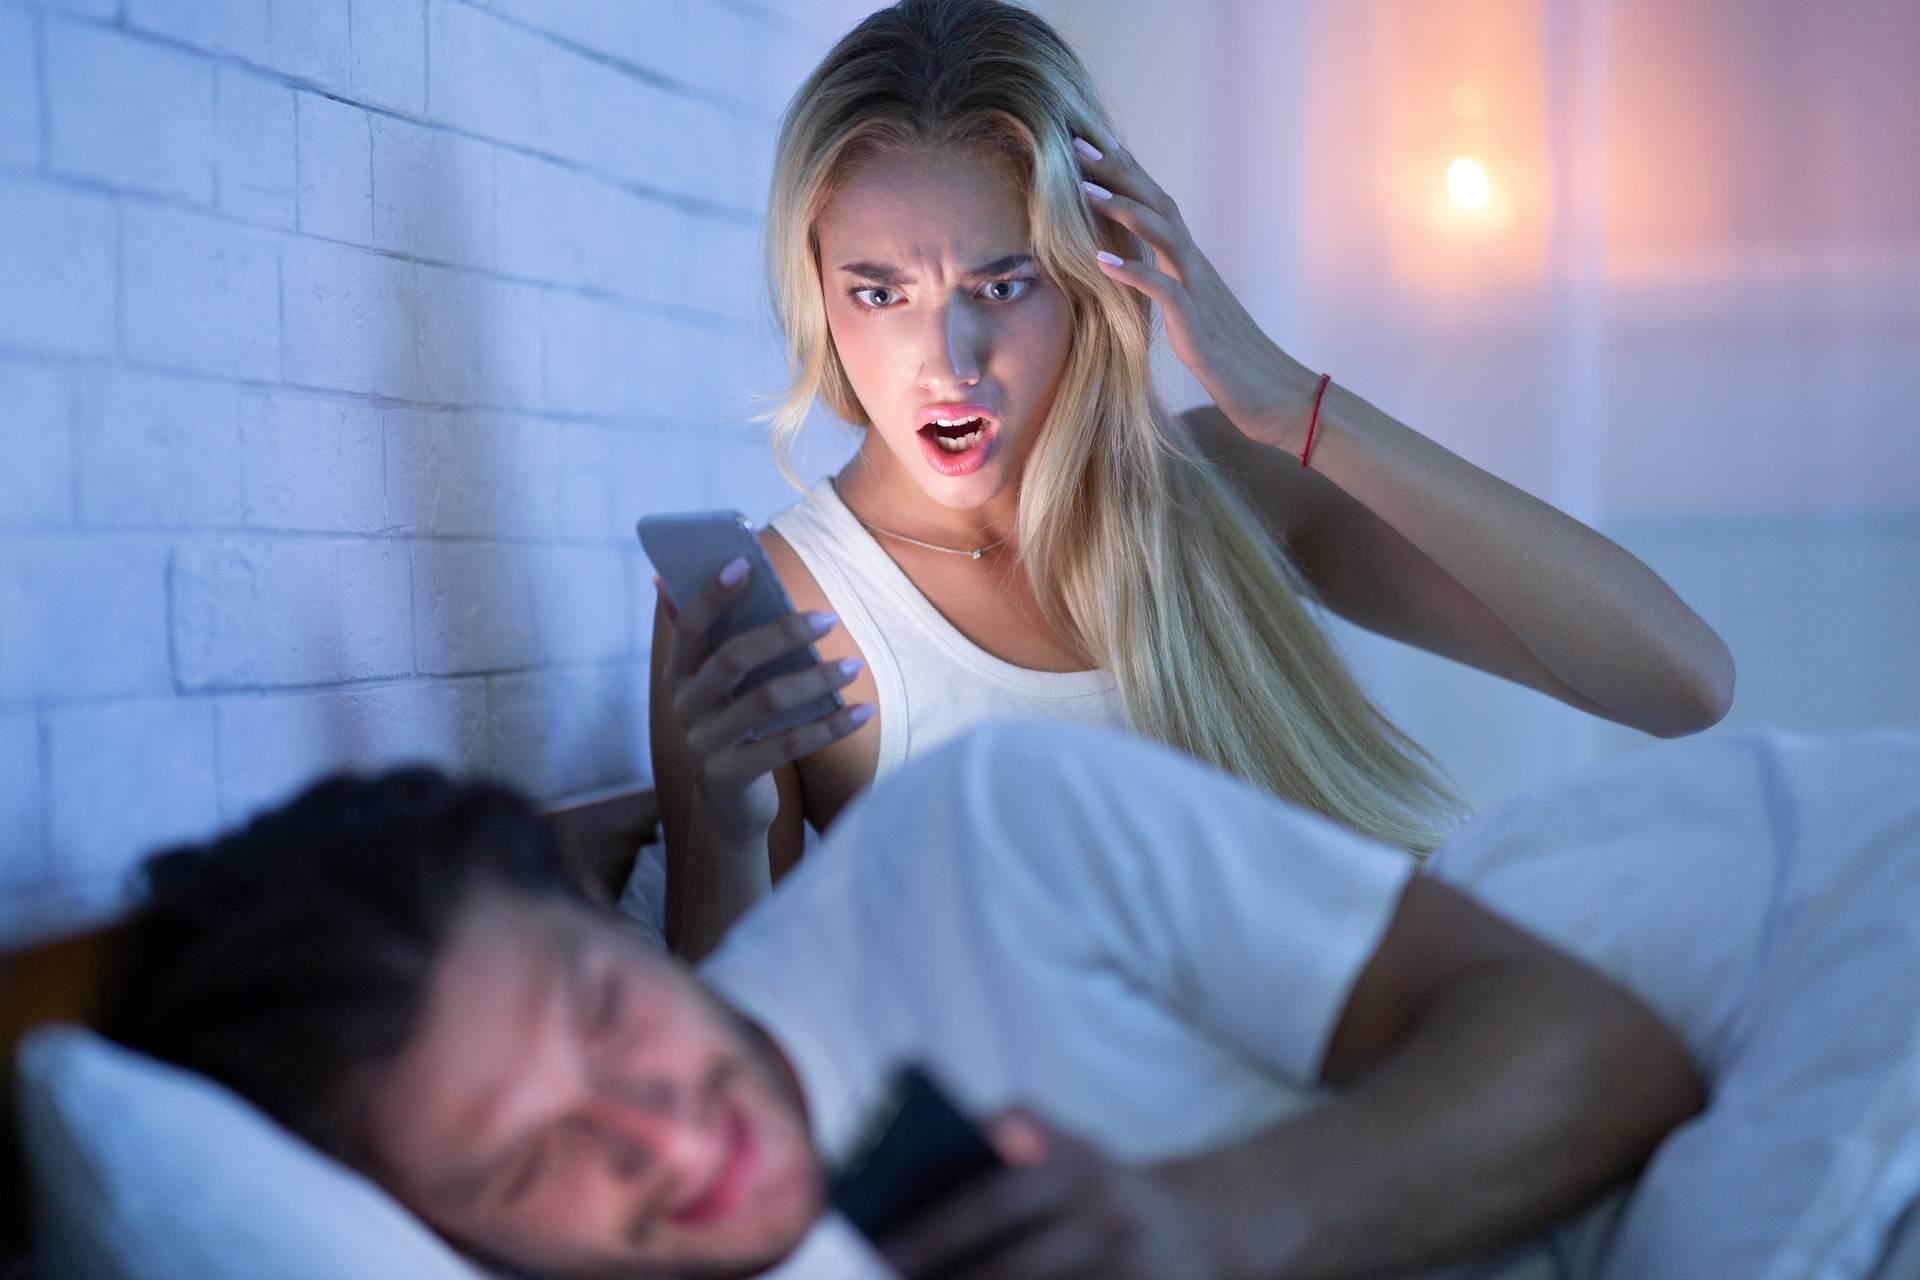 5 znakova da vas vara na Fejsu ili Instagramu ili to tek planira